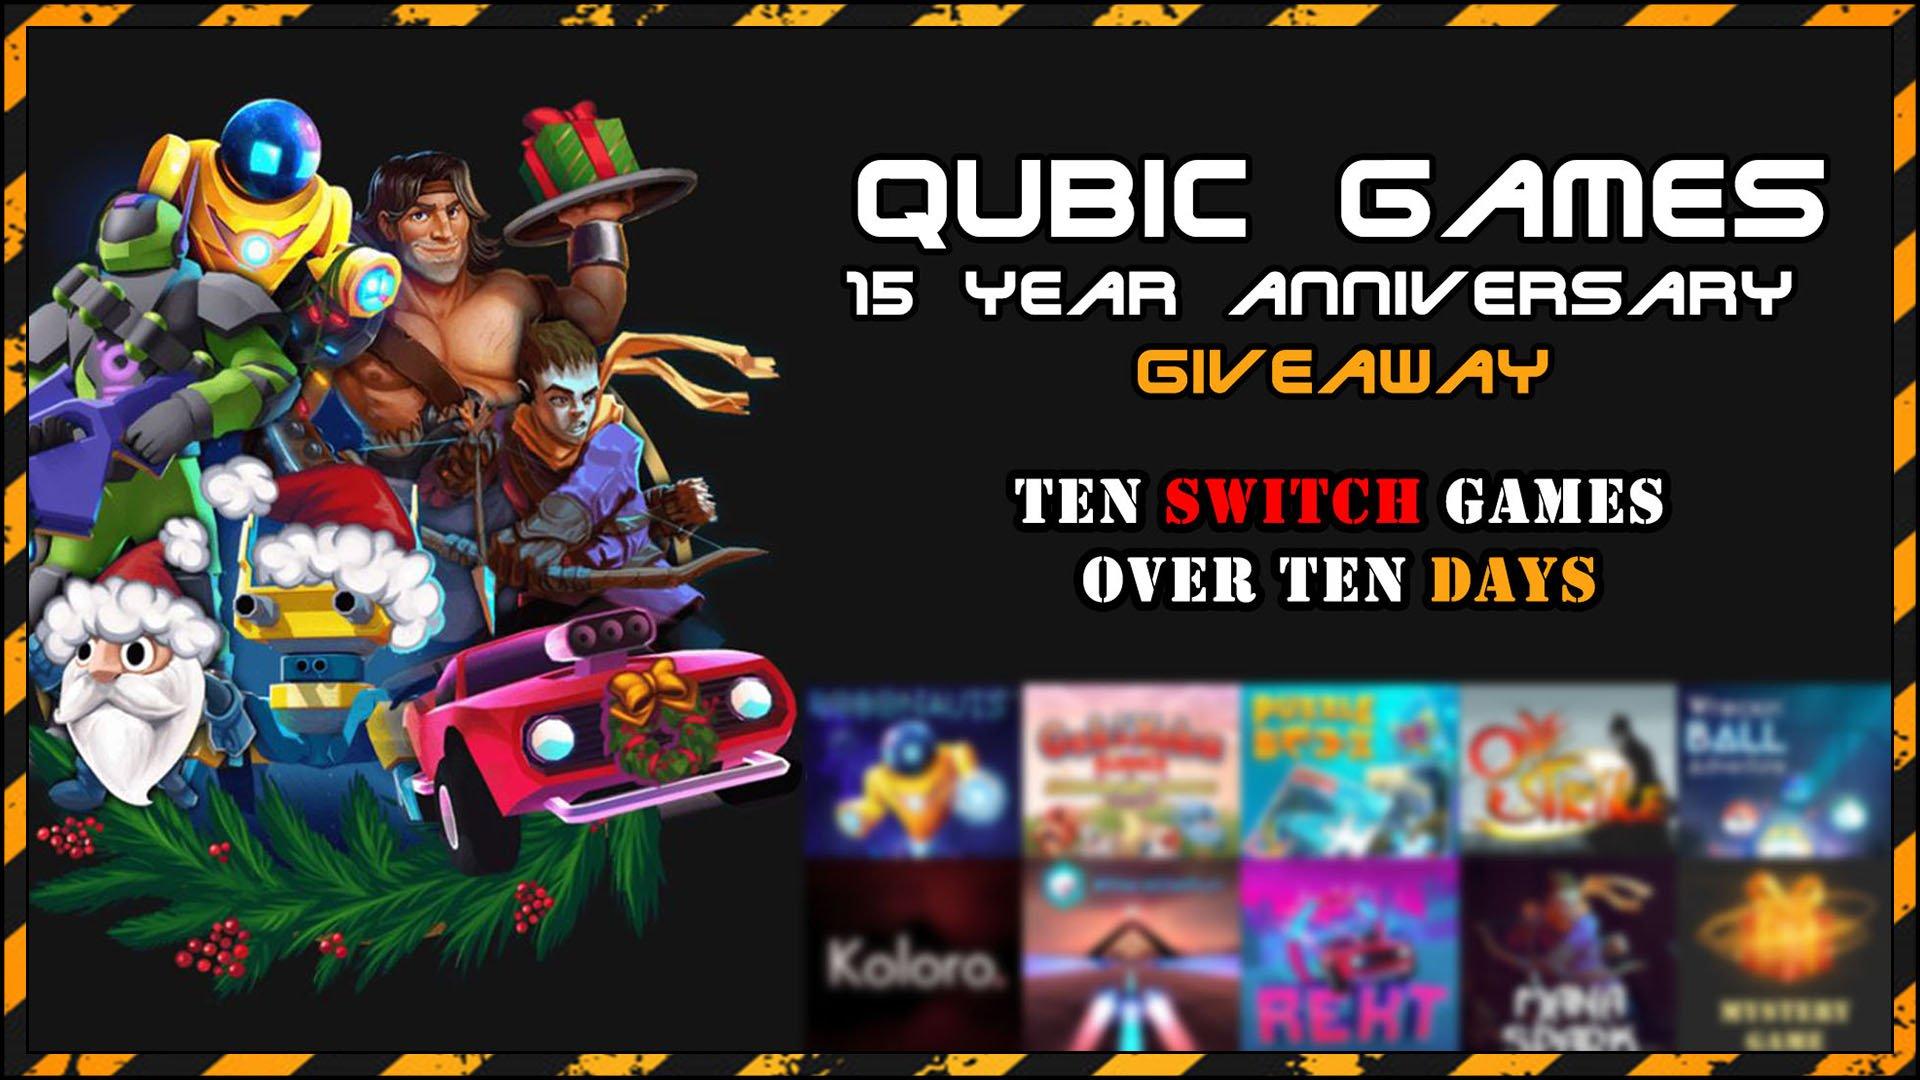 Qubic Games Giveaway 15 Fi3